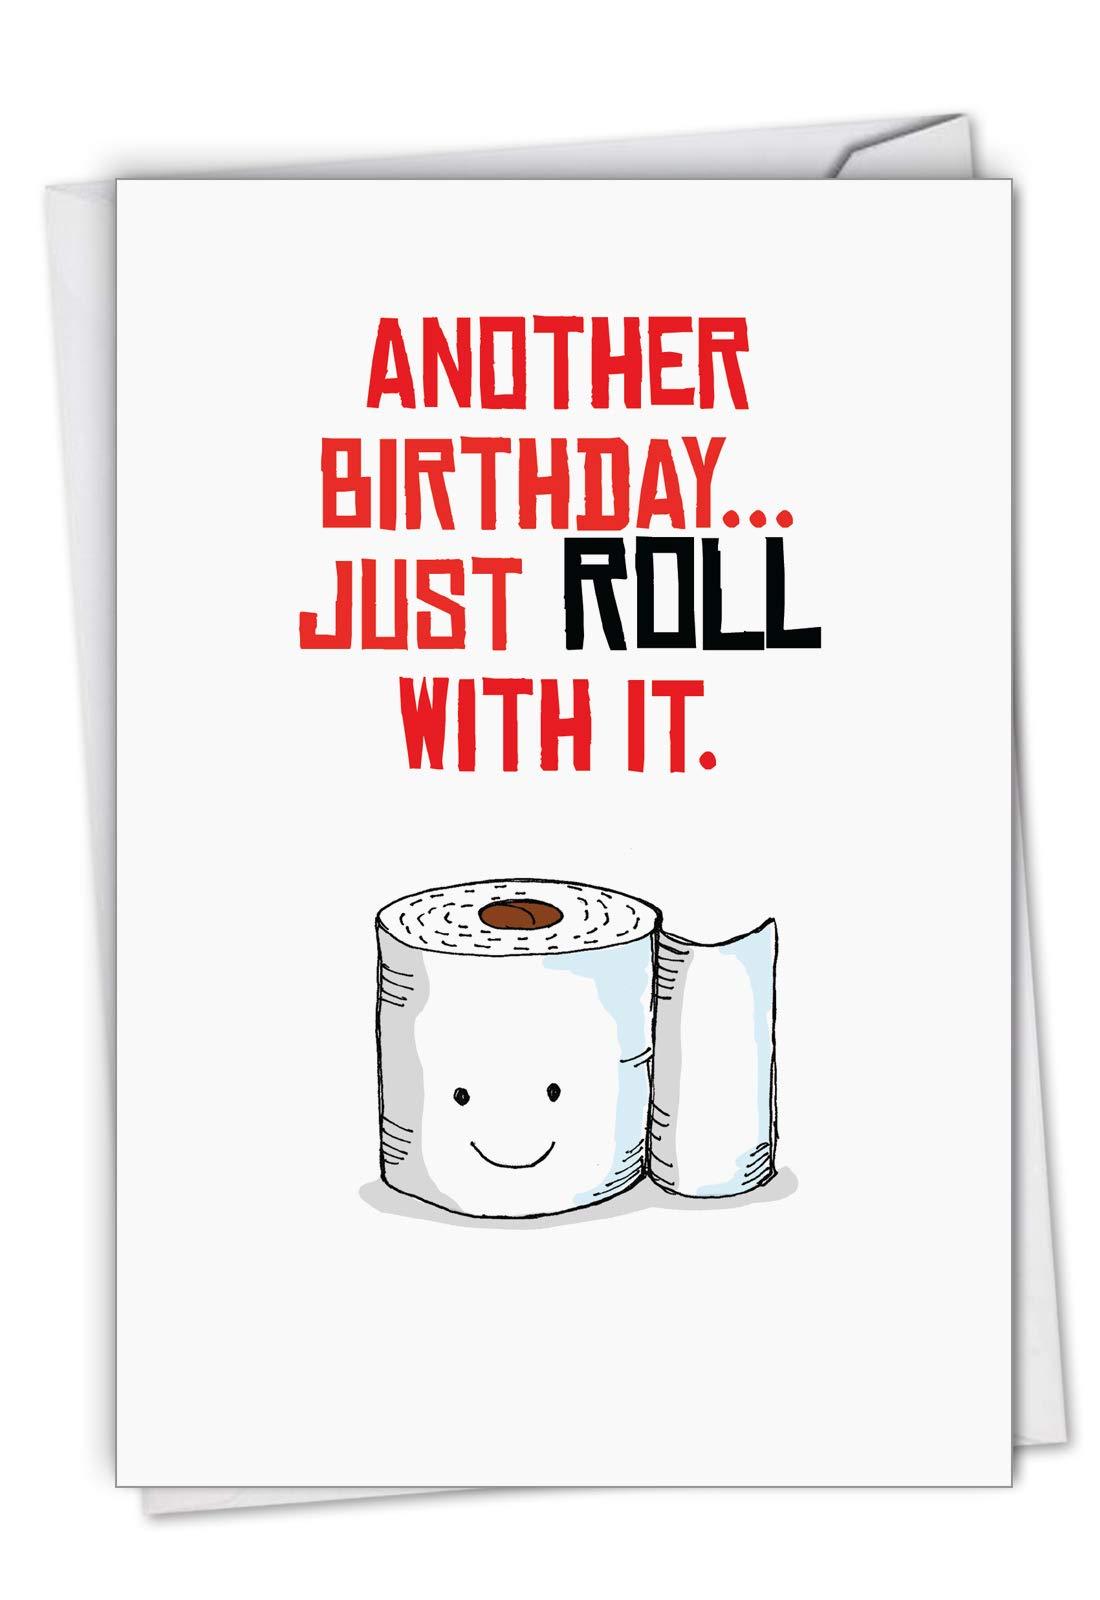 Birthday Puns Roll - Toilet Pun Happy Birthday Card with Envelope (4.63 x 6.75 Inch) - Funny Toilet Paper Joke, Congrats Bday Card for Women, Men - Illustrated Bathroom Humor Gift C6119CBDG